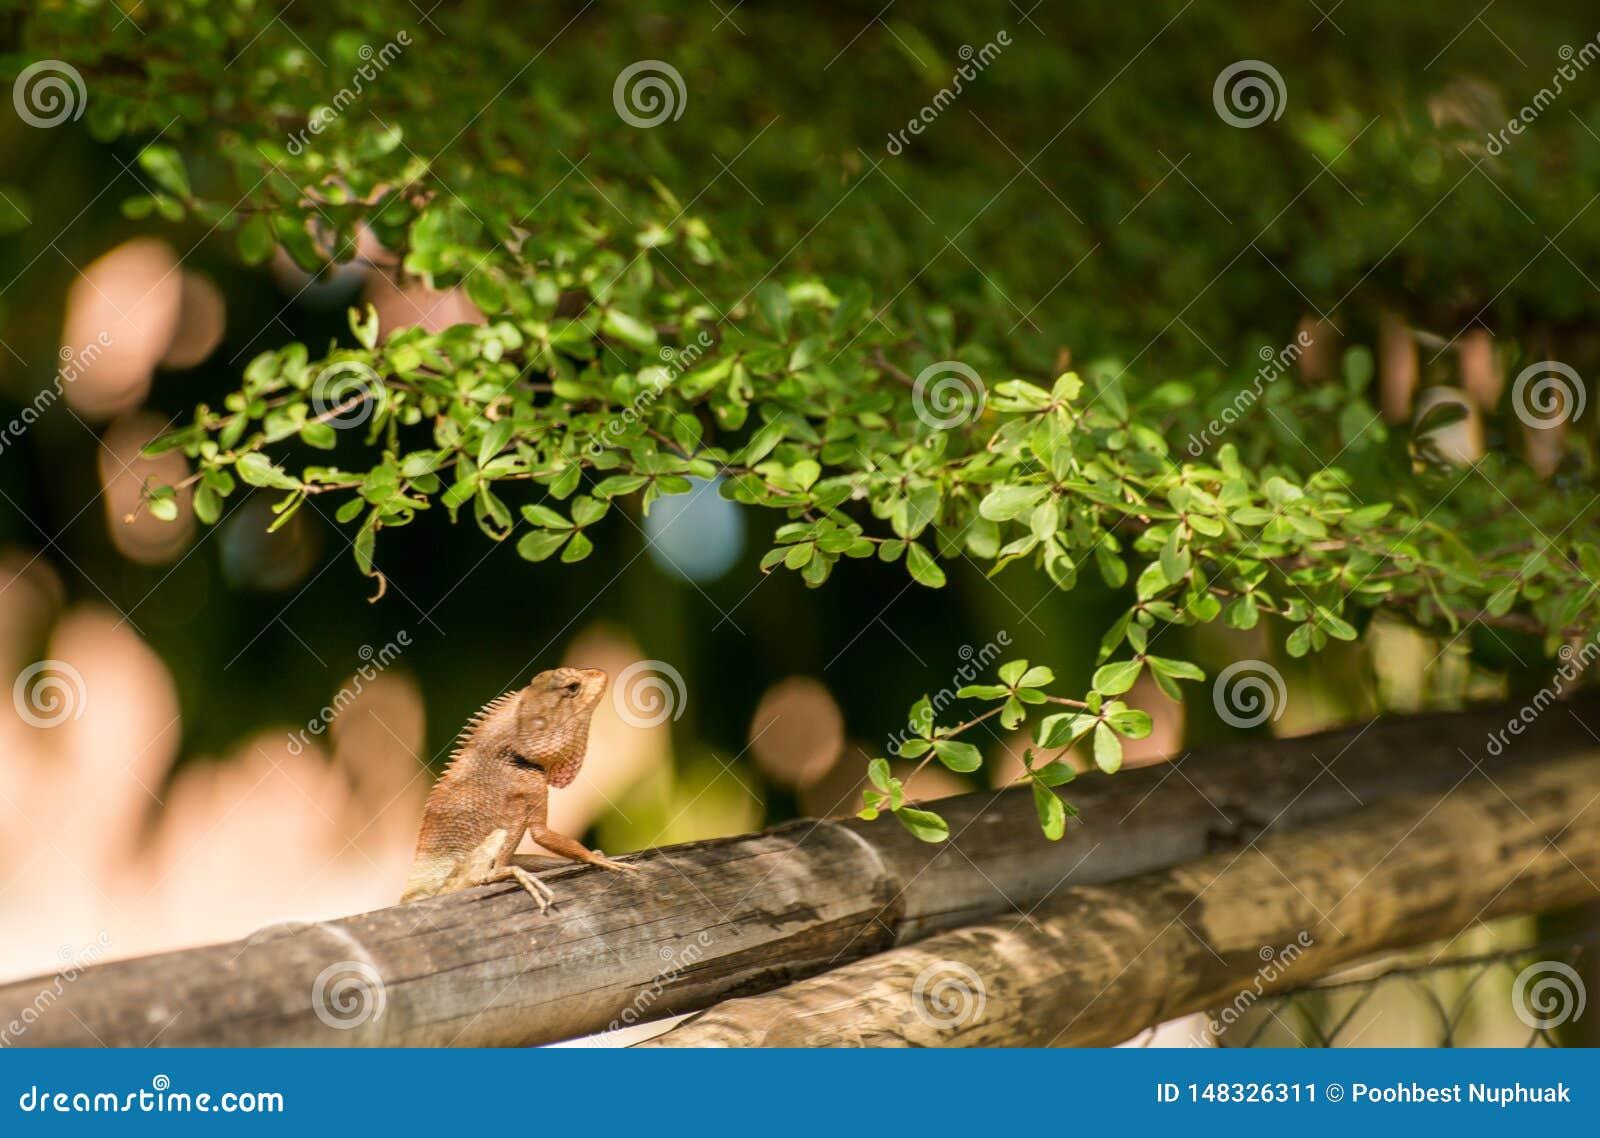 Chameleon climb on bamboo